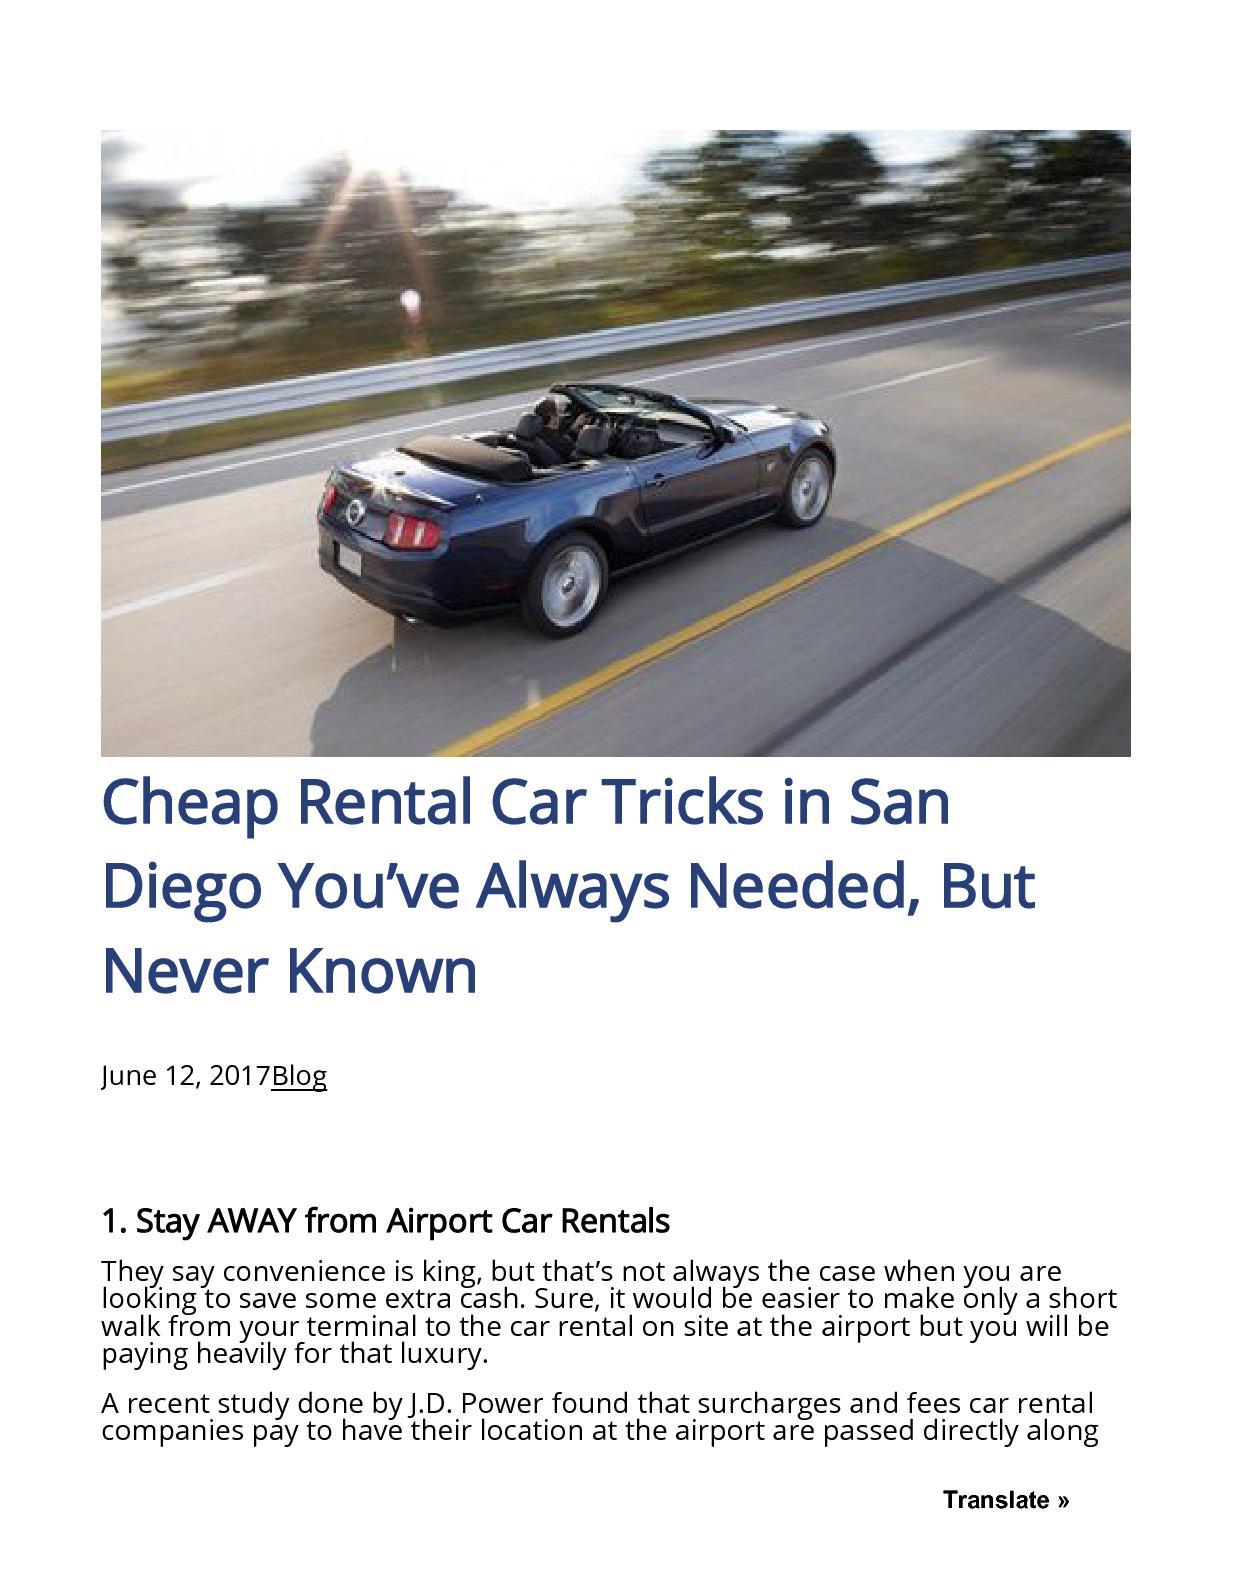 Cheap Rental Cars San Diego >> Calameo Cheap Rental Car Tricks In San Diego You Ve Always